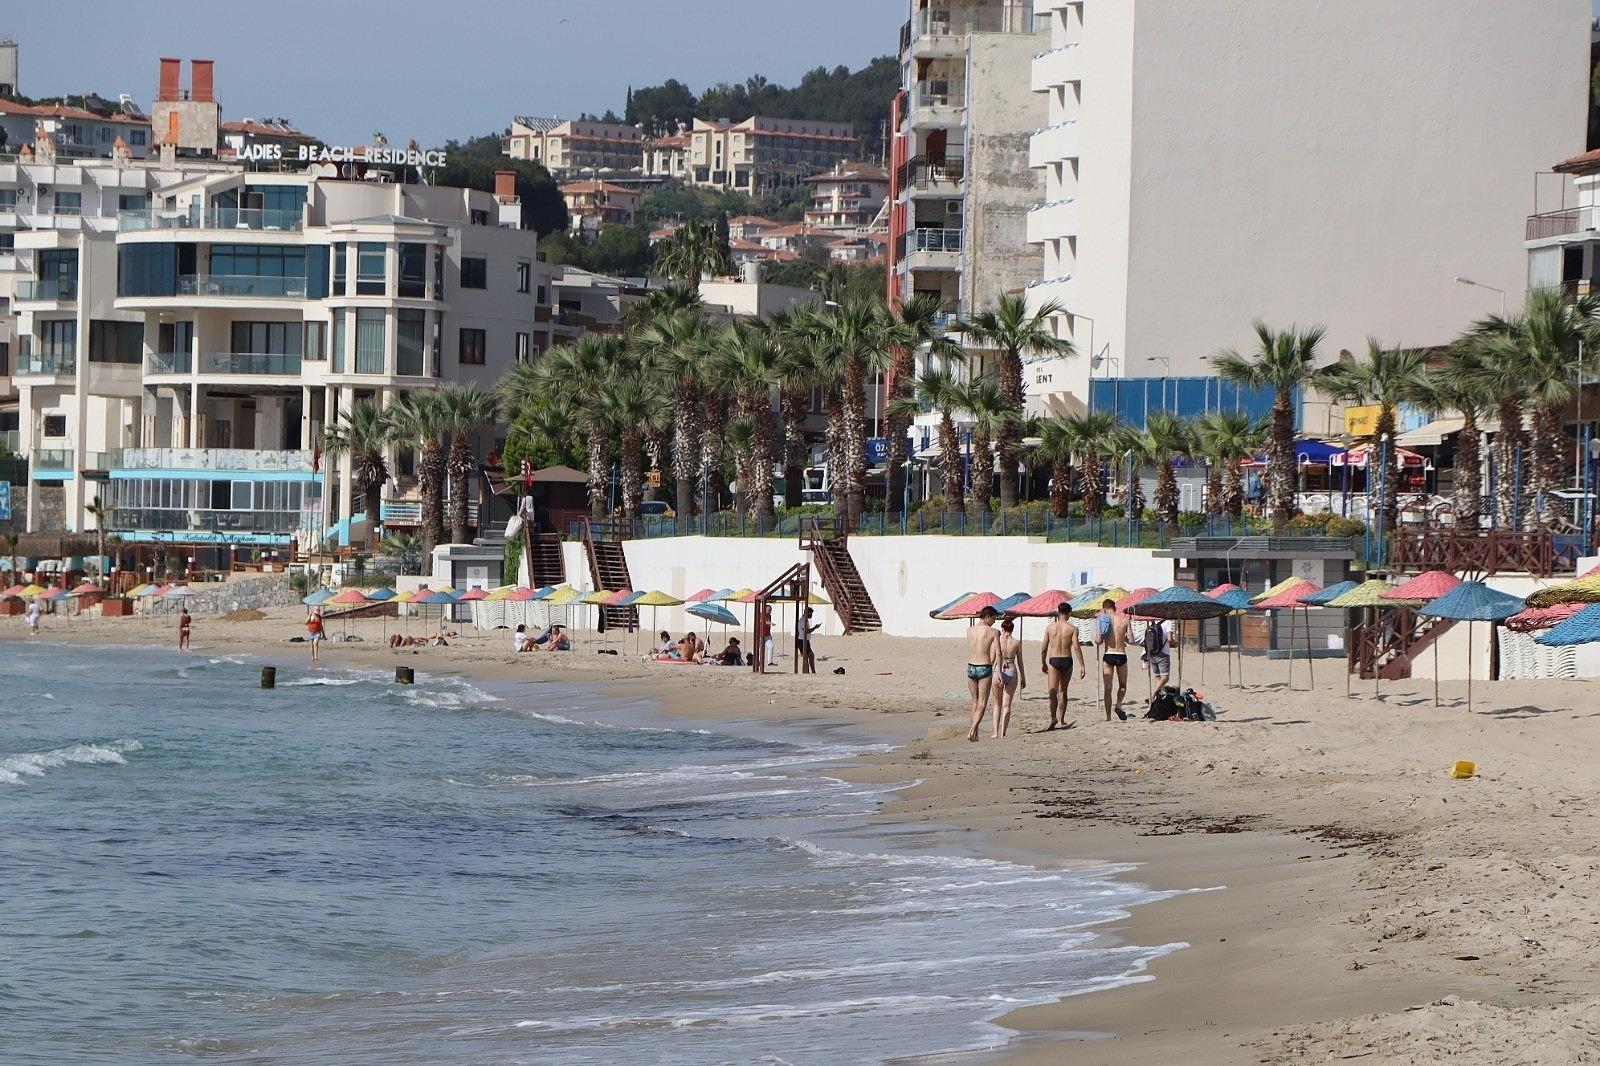 2021/05/kusadasinda-turistler-sahile-akin-etti-20210506AW31-4.jpg